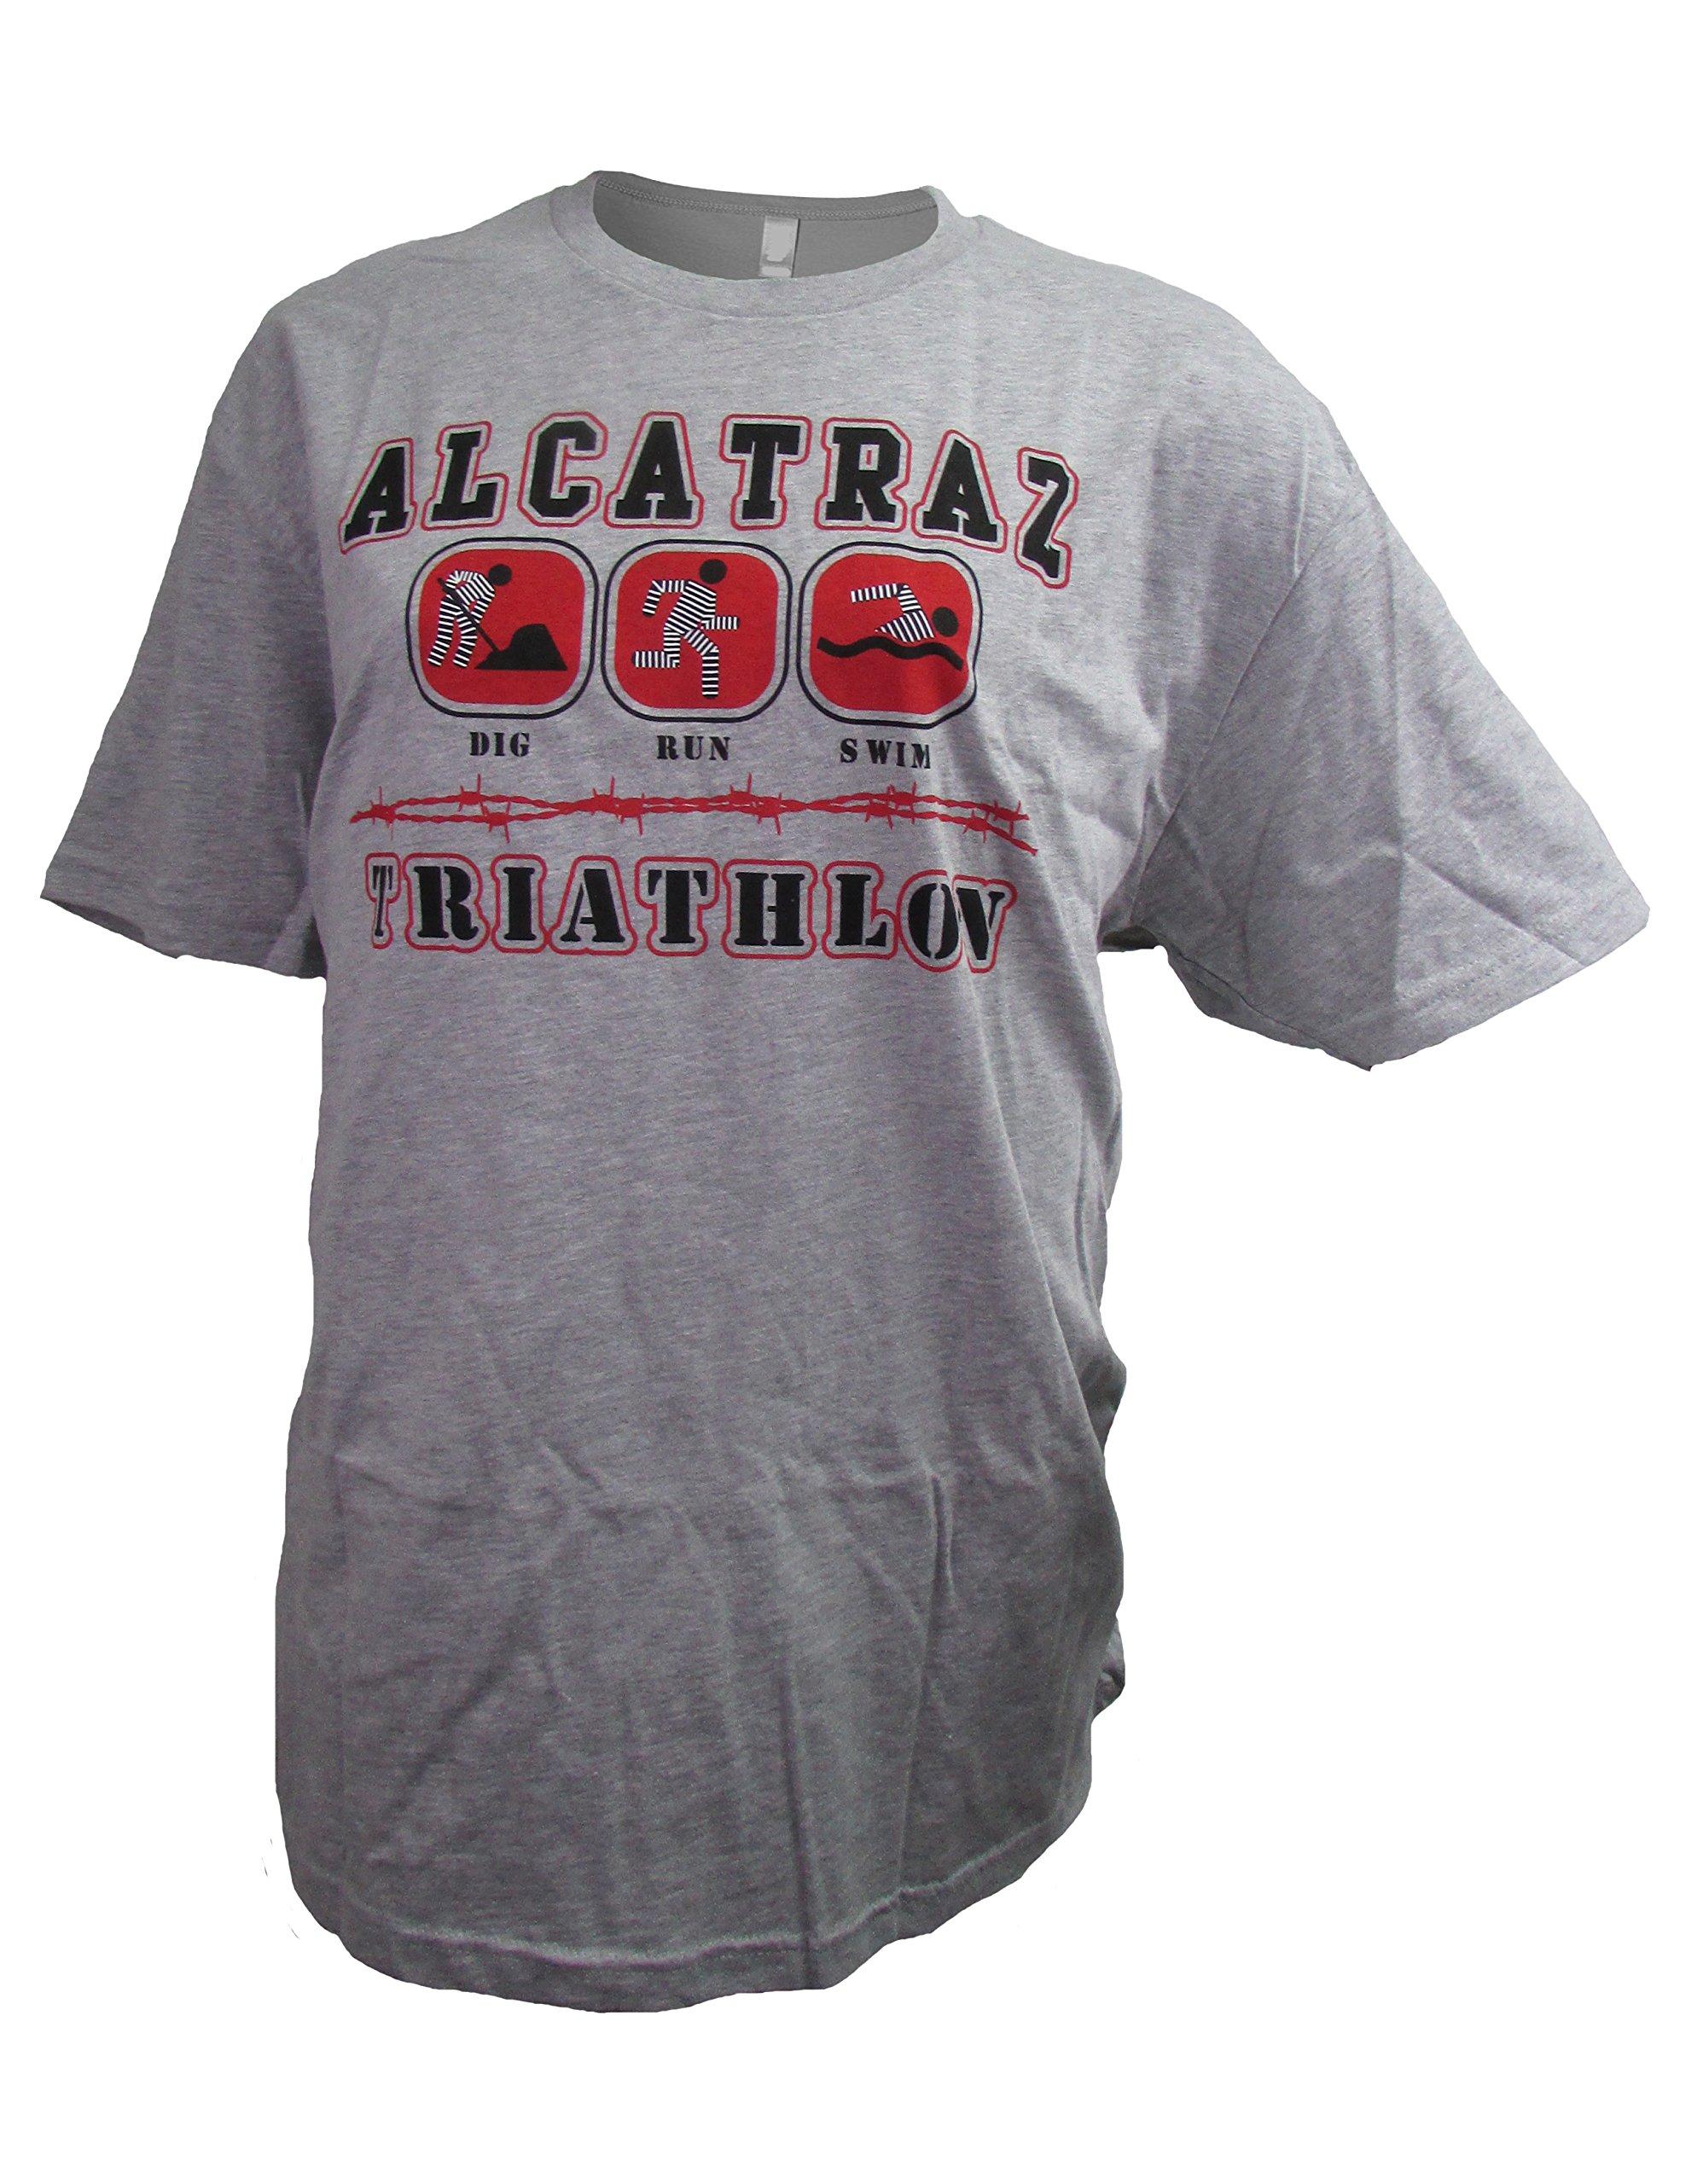 San Francisco Vintage Alcatraz Triathlon Men's Heather Gray Crew Neck T-Shirt (Medium)